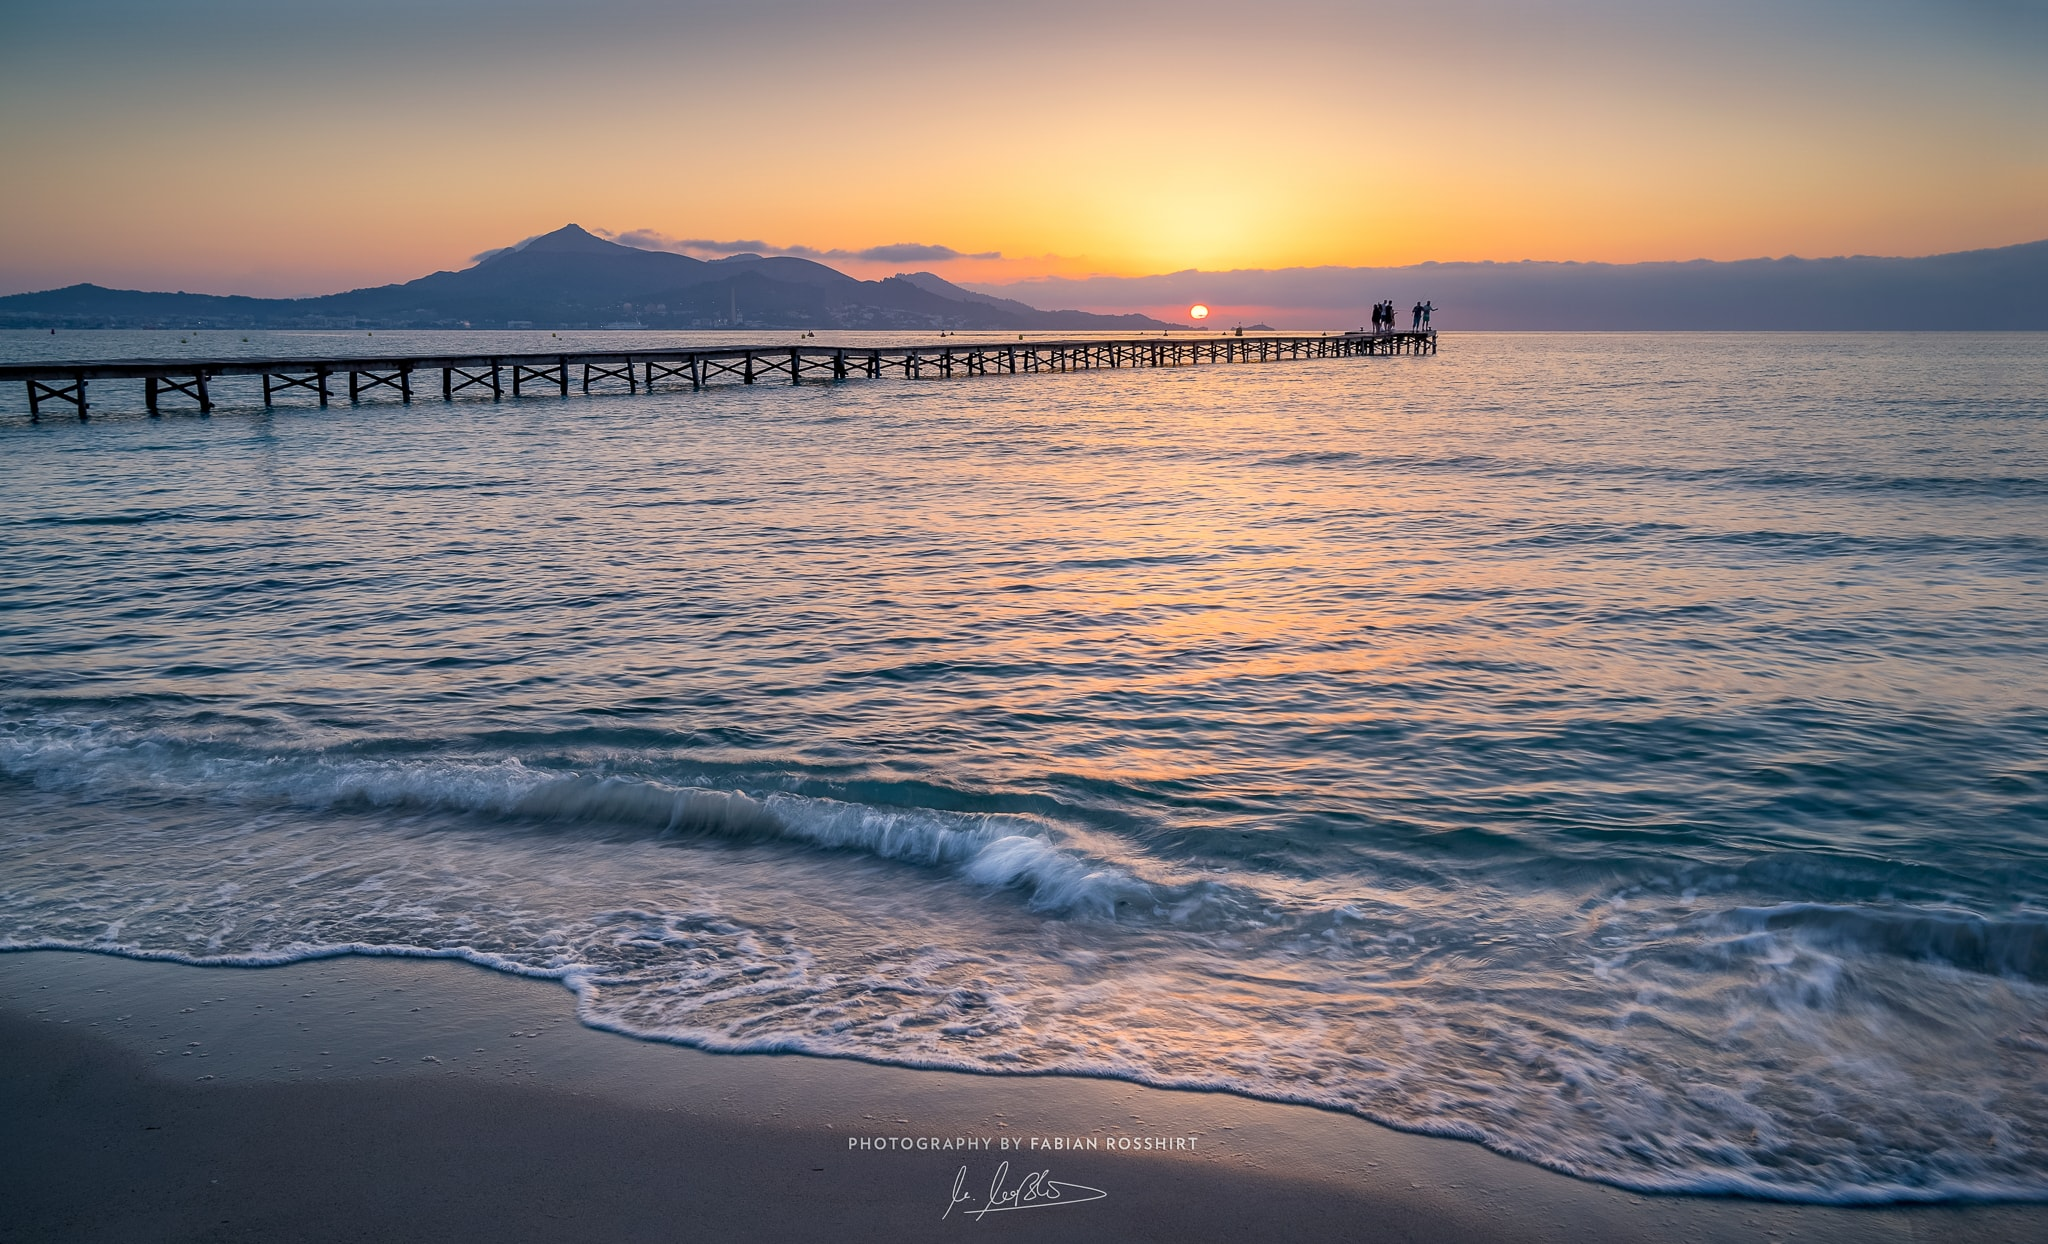 Mallorca Spain Wallpaper Photography Landscape HD Island 2048x1244